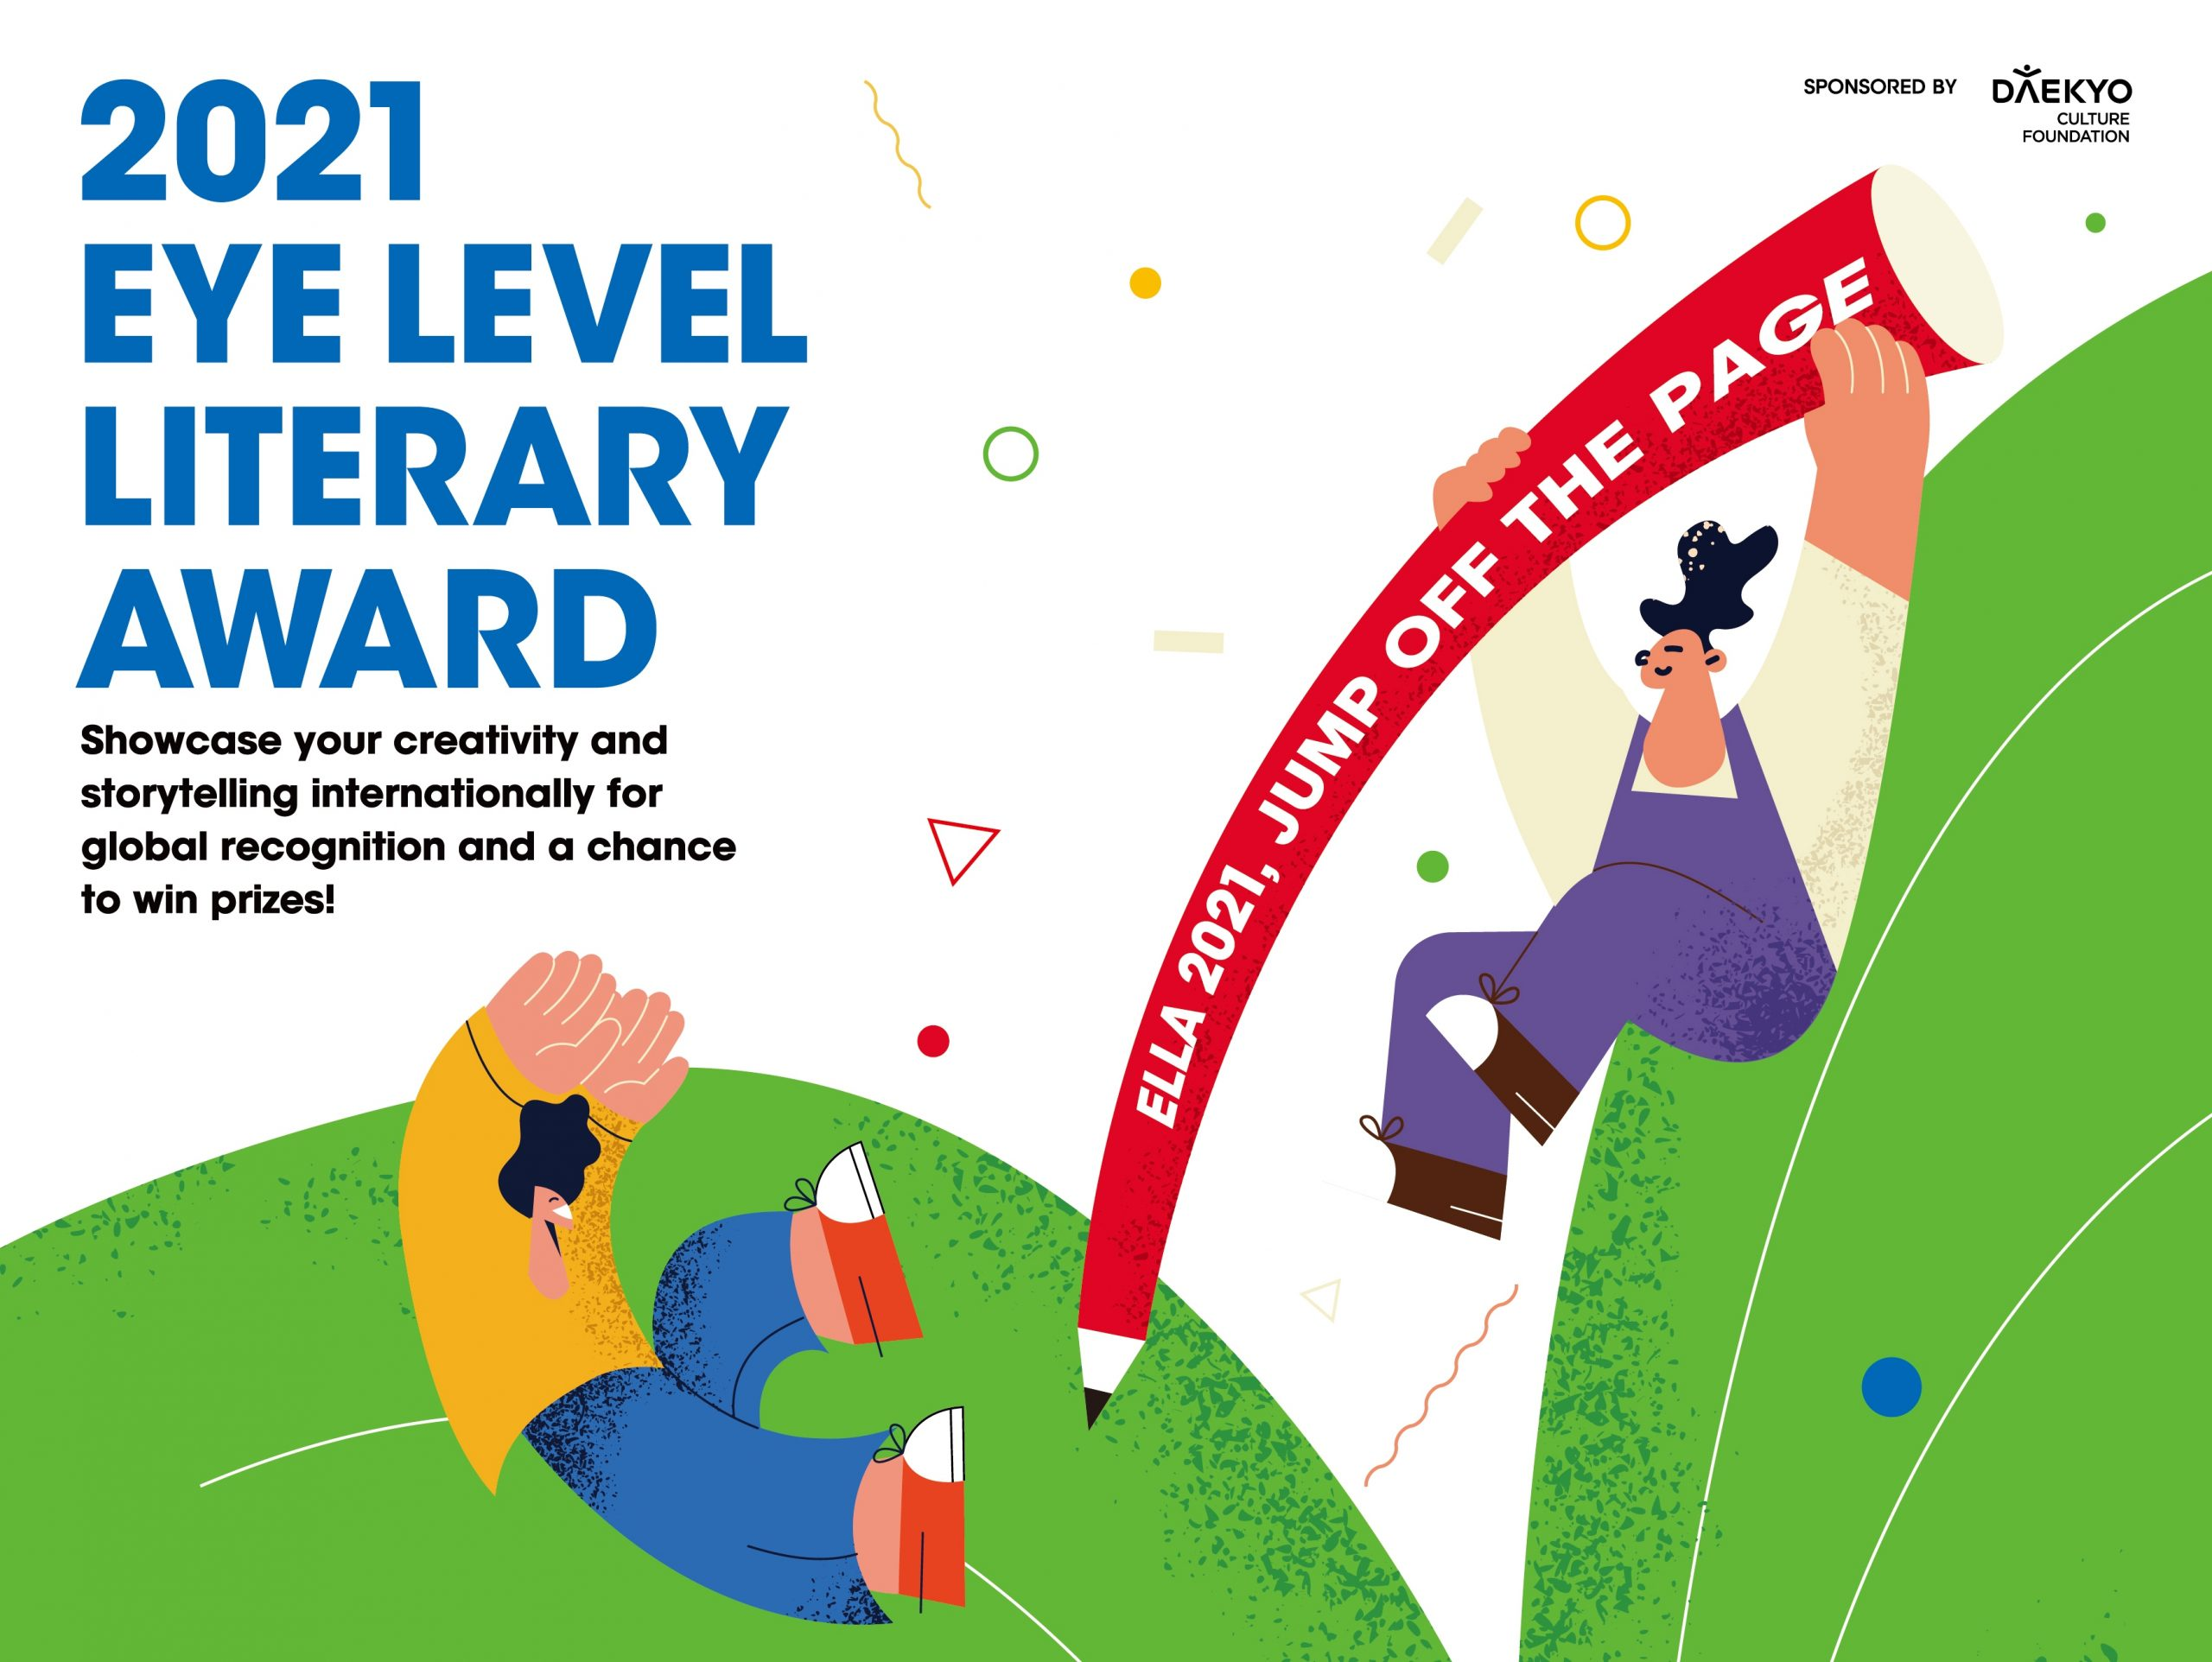 Eye Level Literary Award 2021